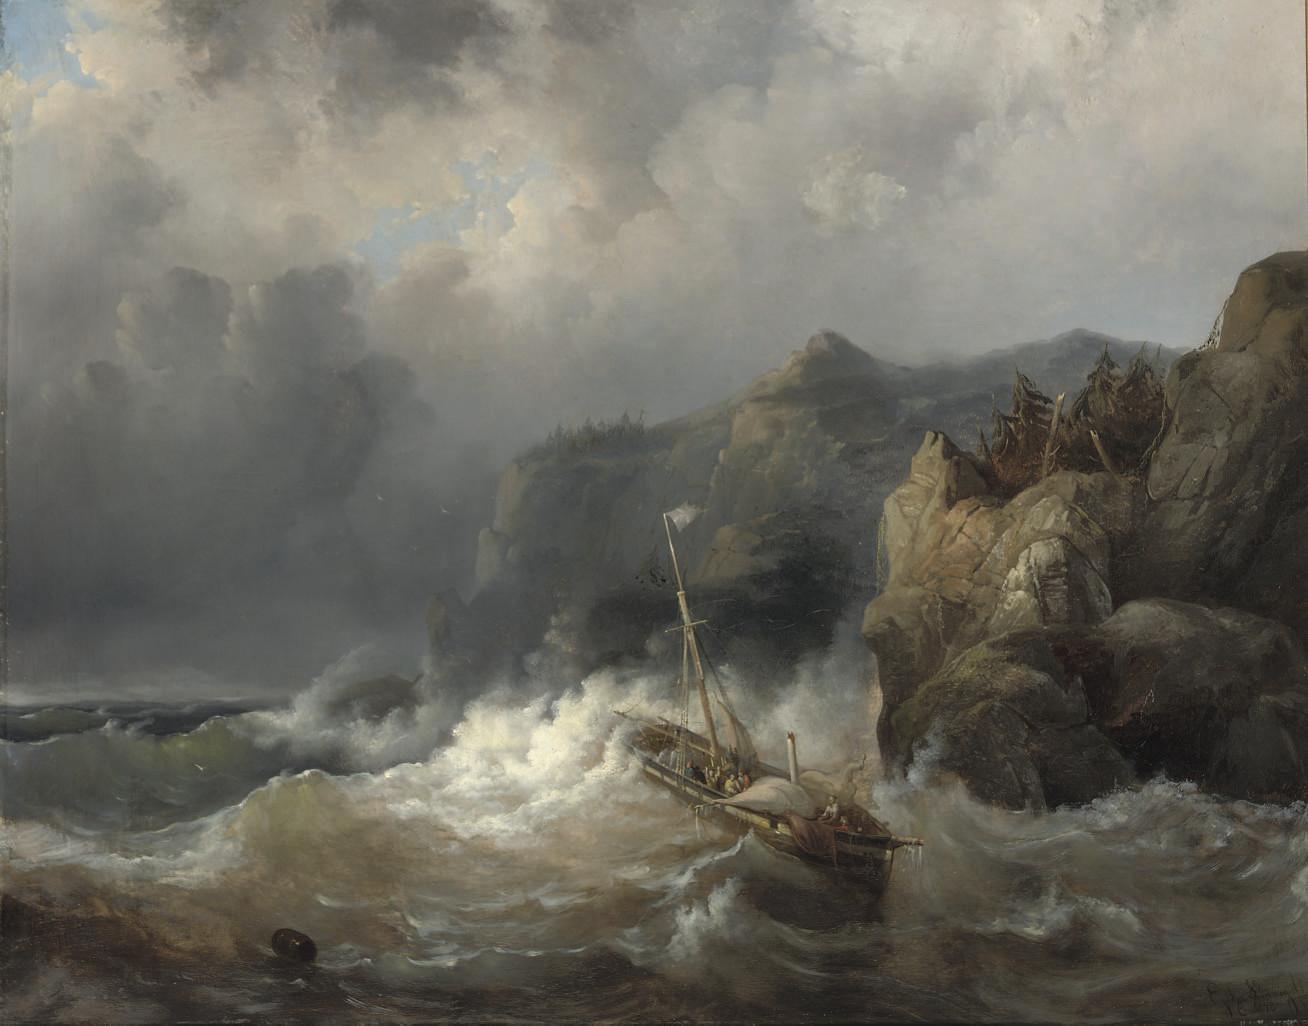 A shipwreck of a rocky coast